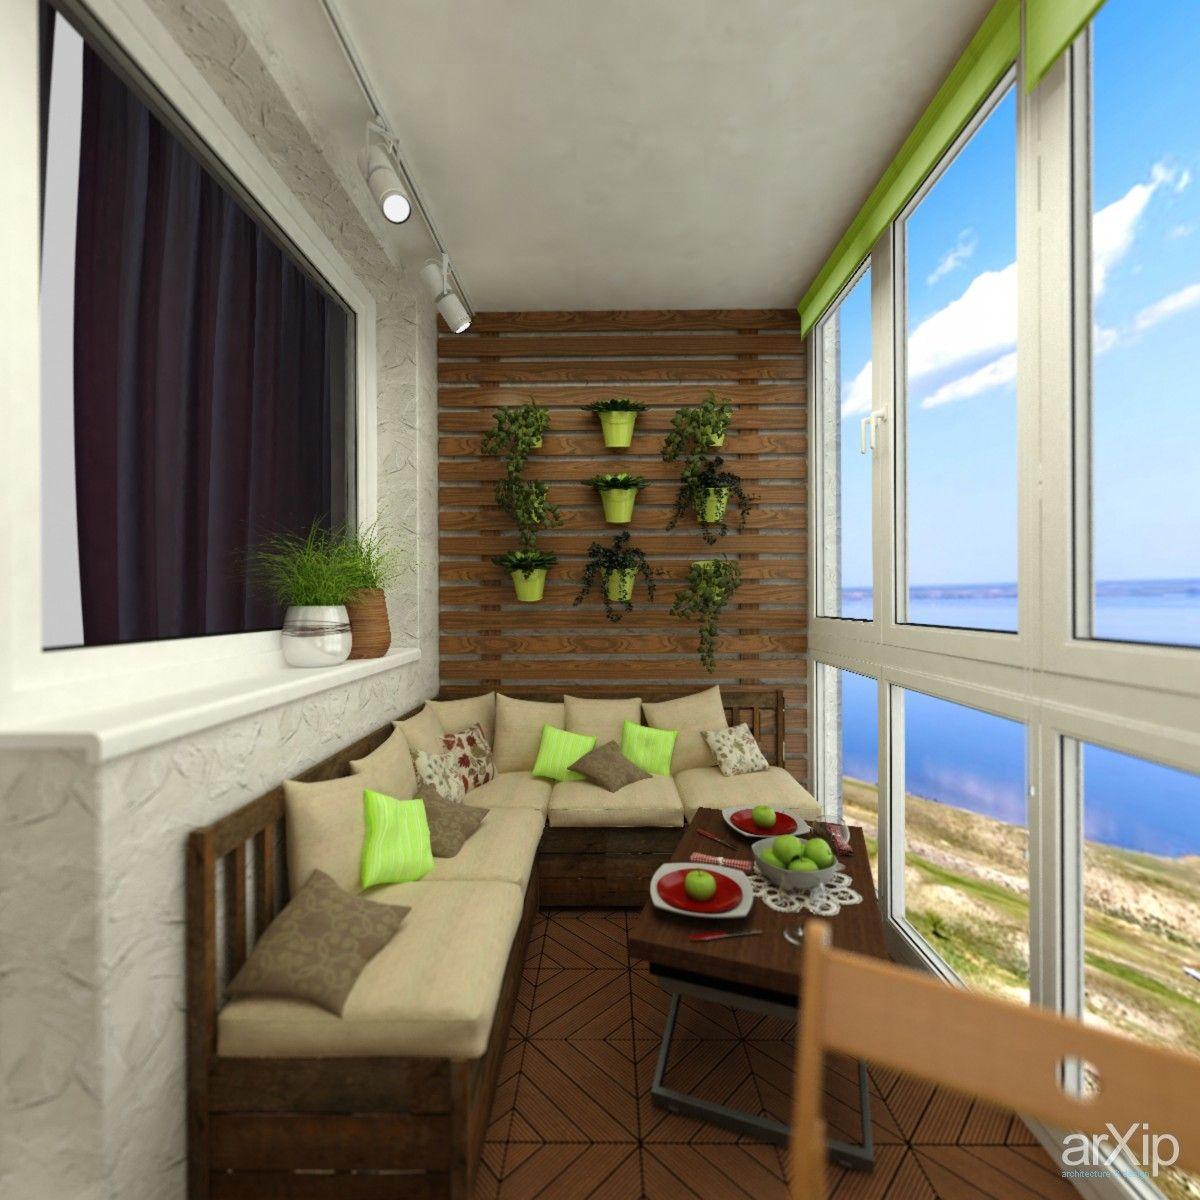 Pin von Nikola Nico auf balcony | Pinterest | Balkon, Anbau und ...